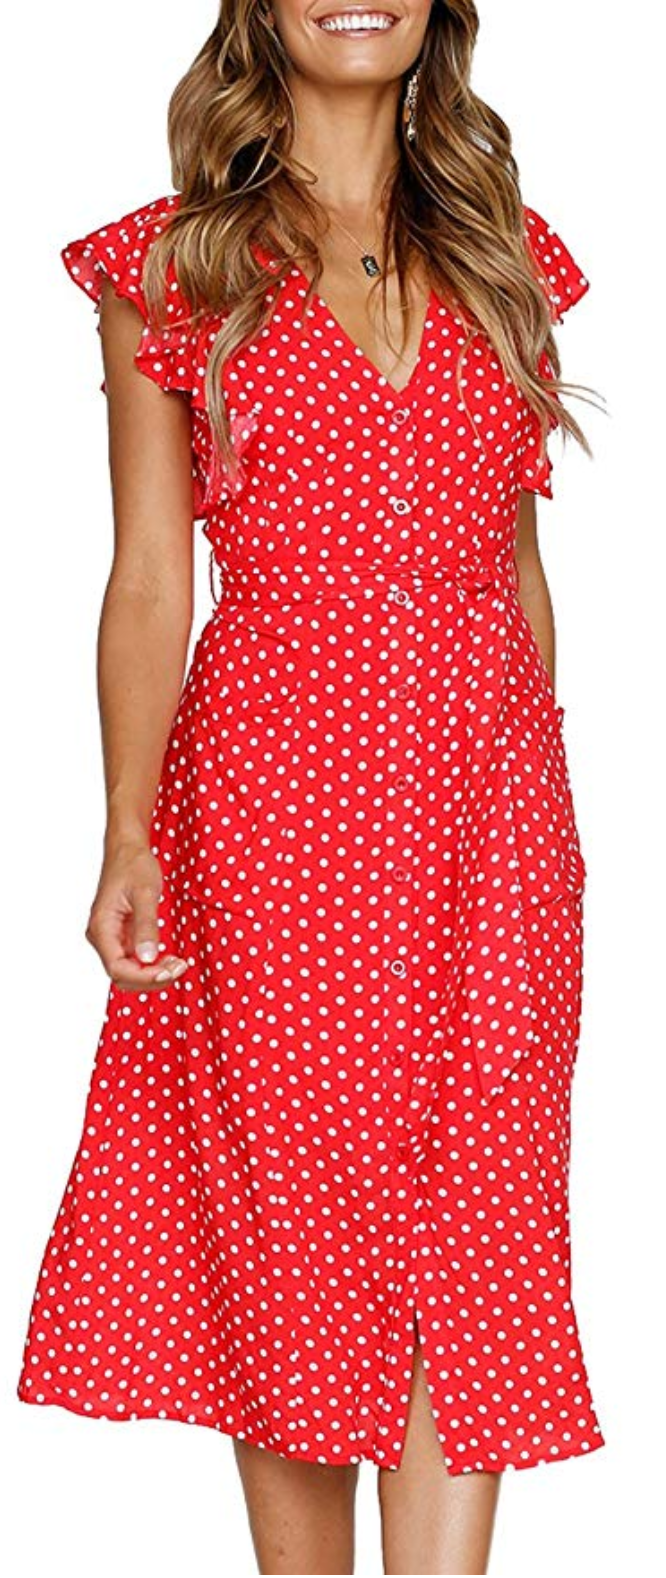 Mitilly Women S Summer Boho Polka Dot Sleeveless V Neck Swing Midi Dress Pockets Medium Red Gorgeous Casual Midi Swing Dress Midi Dress Casual Womens Dresses [ 1578 x 666 Pixel ]